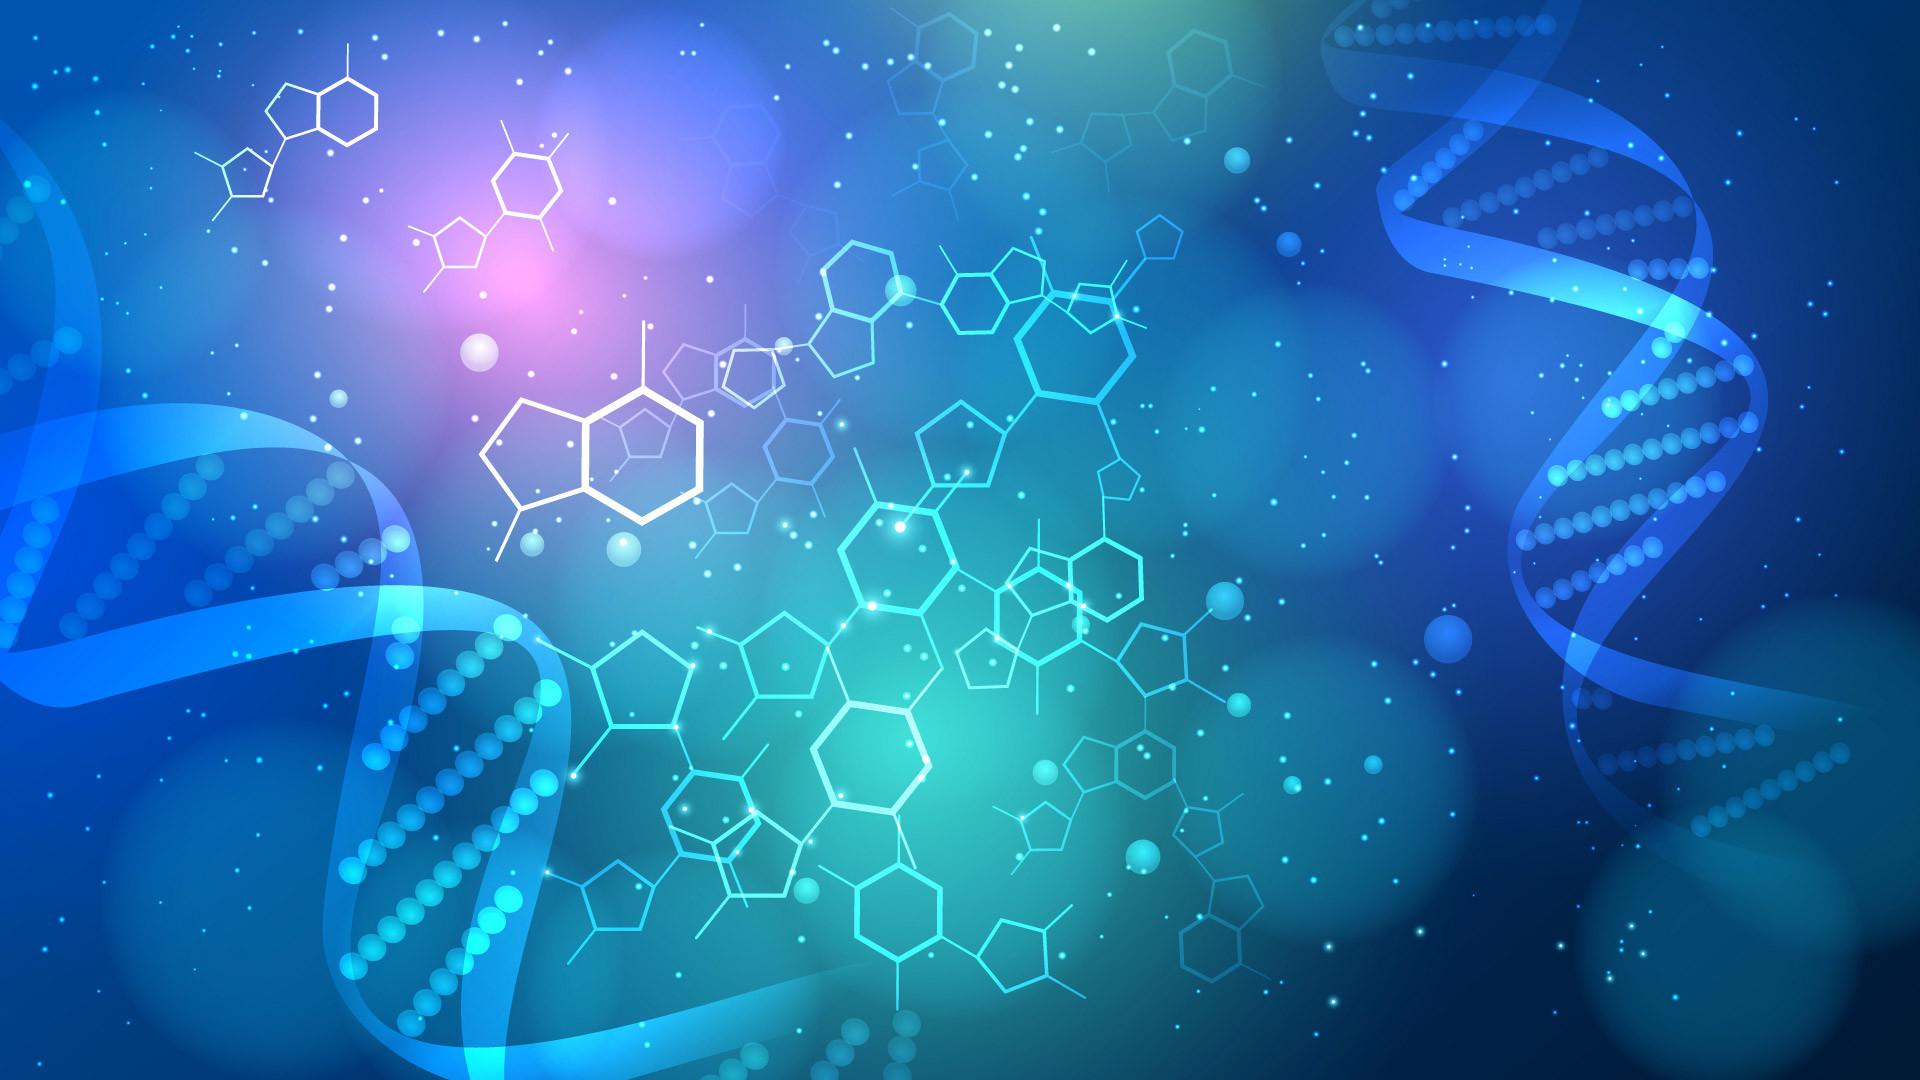 Biochemistry Wallpaper 67 images 1920x1080